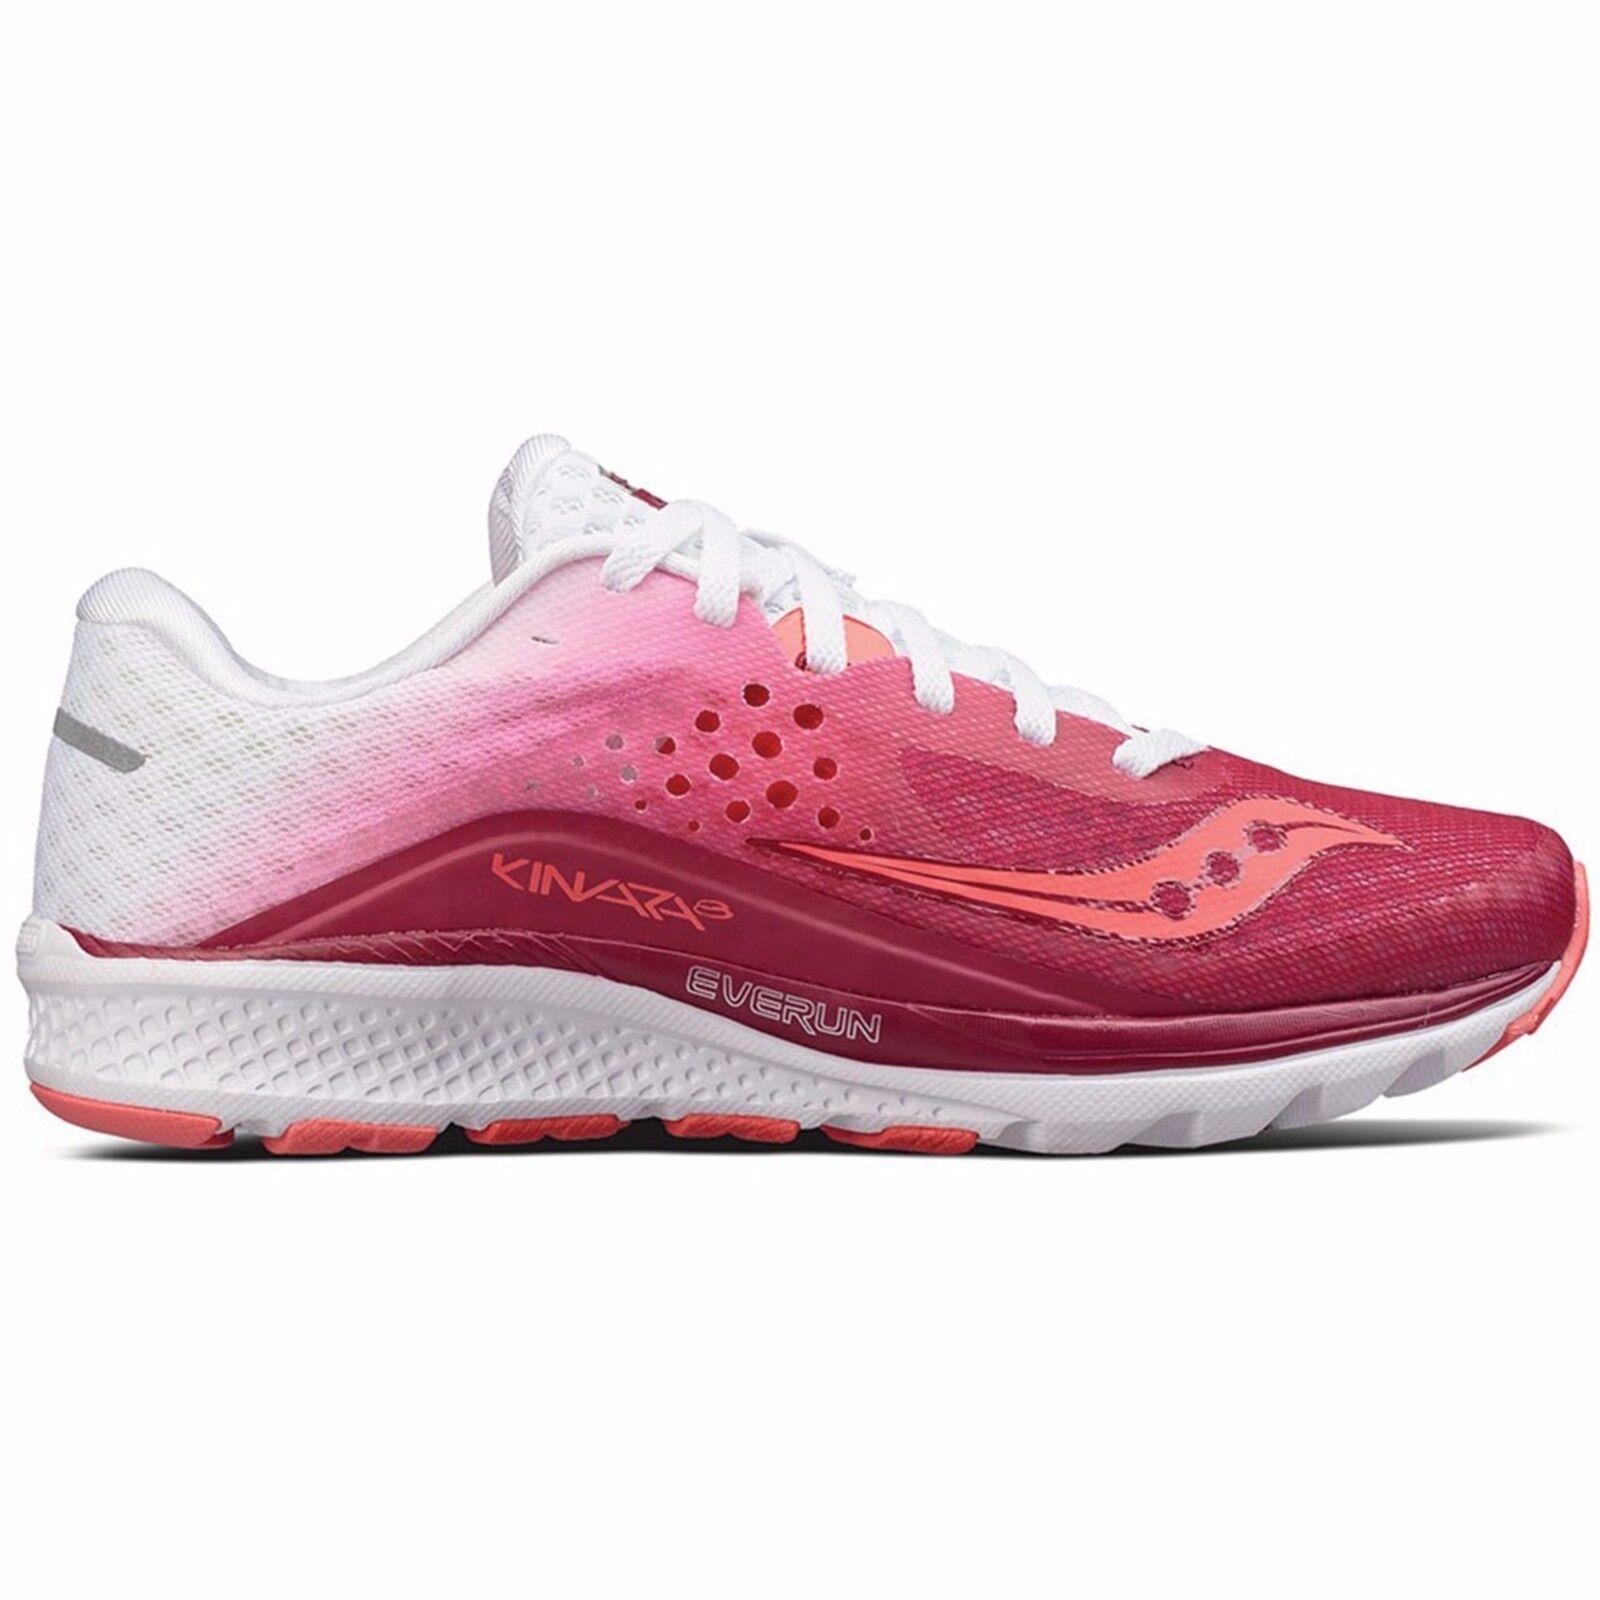 Saucony Kinvara 8 women Running shoes Scarpa pink purple Corsa Strada S10356-5